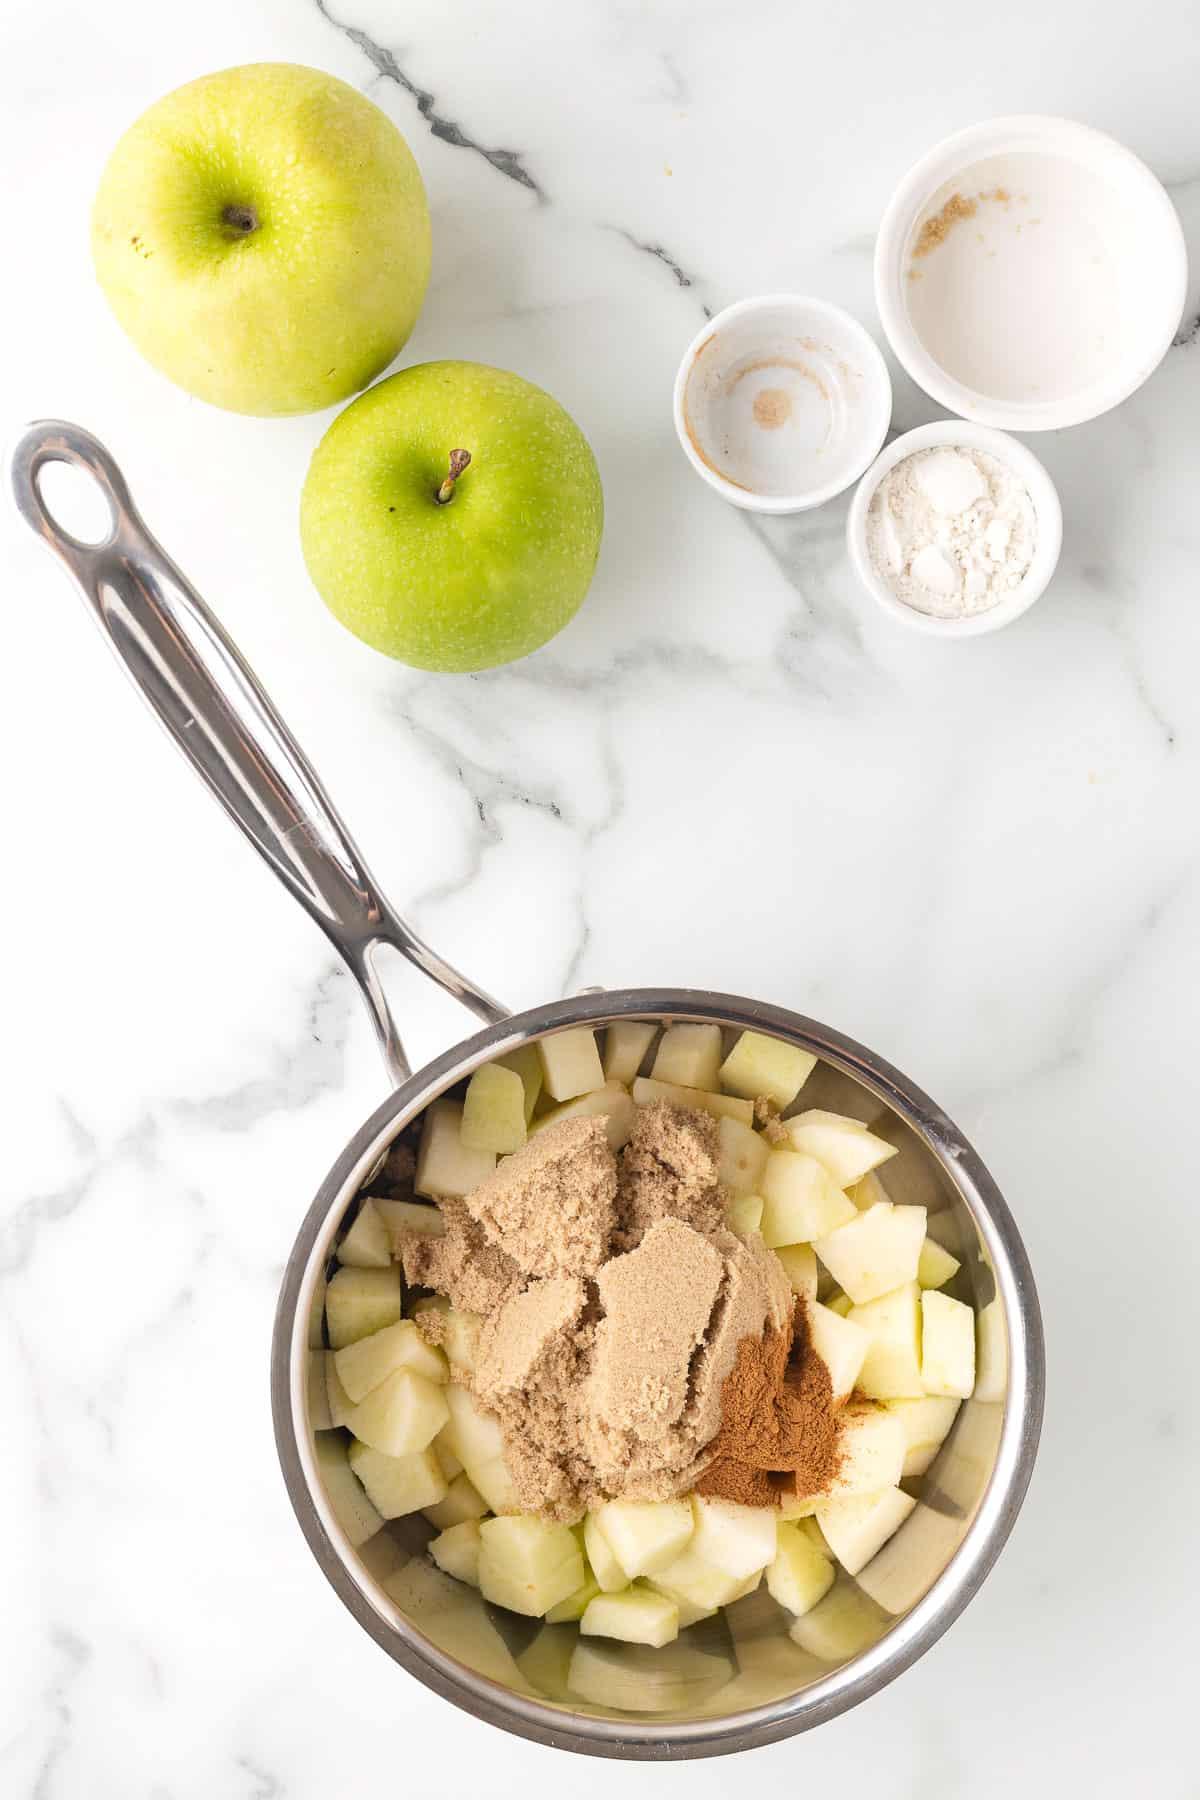 sauce pan with apples, brown sugar, and cinnamon to make apple pie